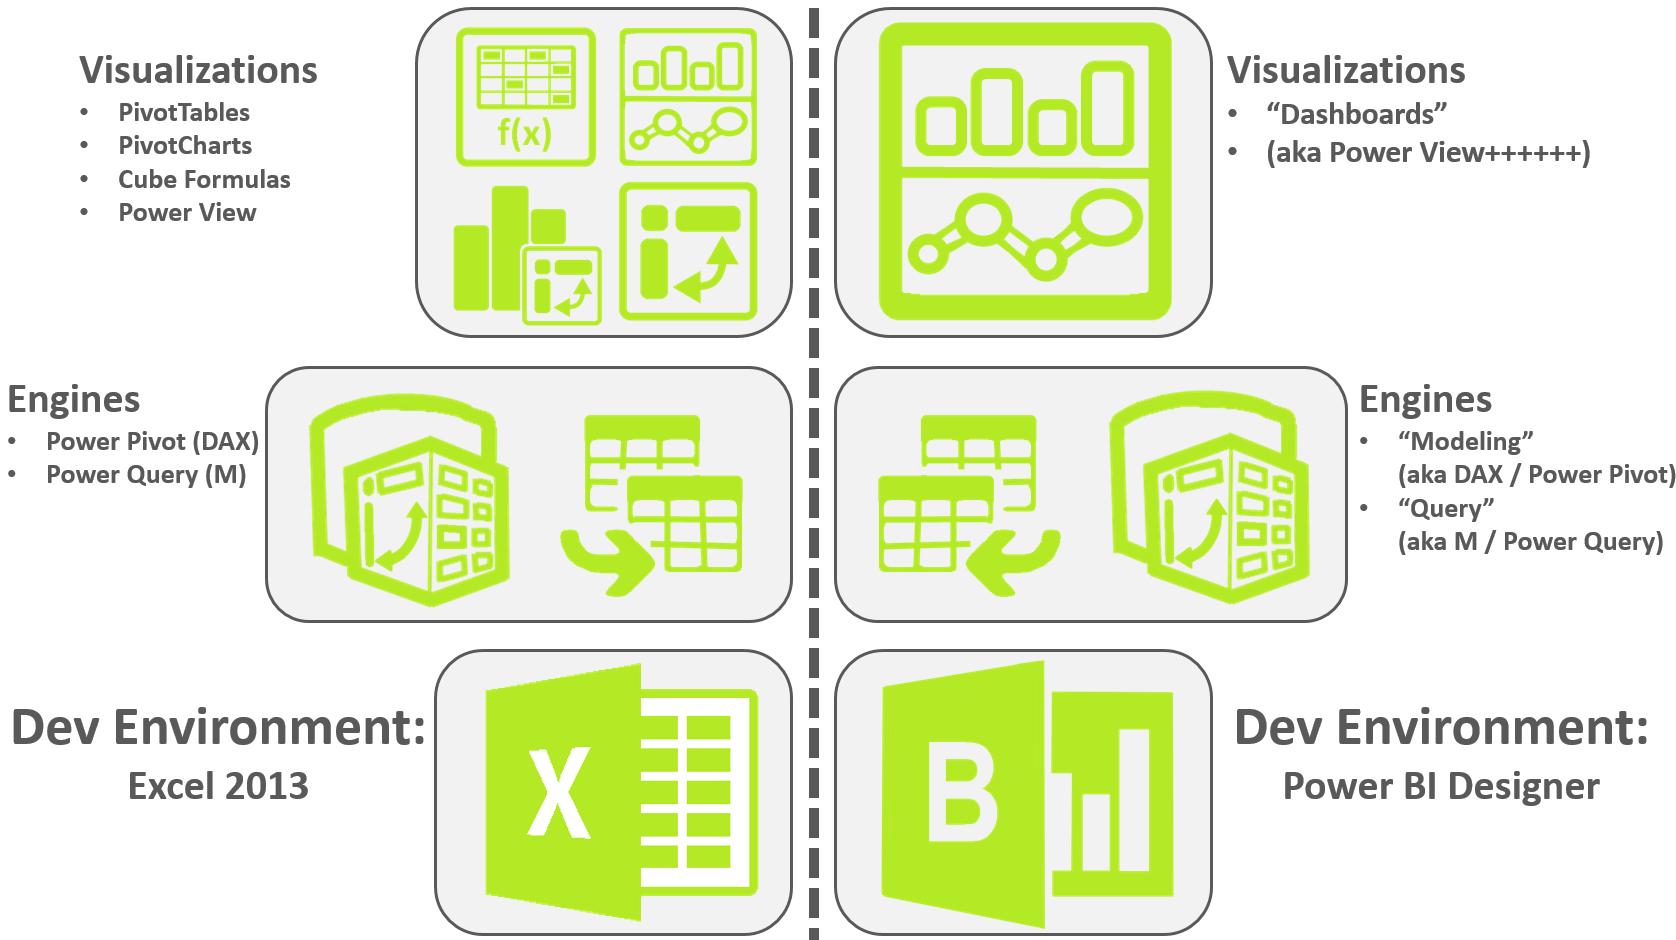 Comparing Excel Power Bi Vs Power Bi Designer